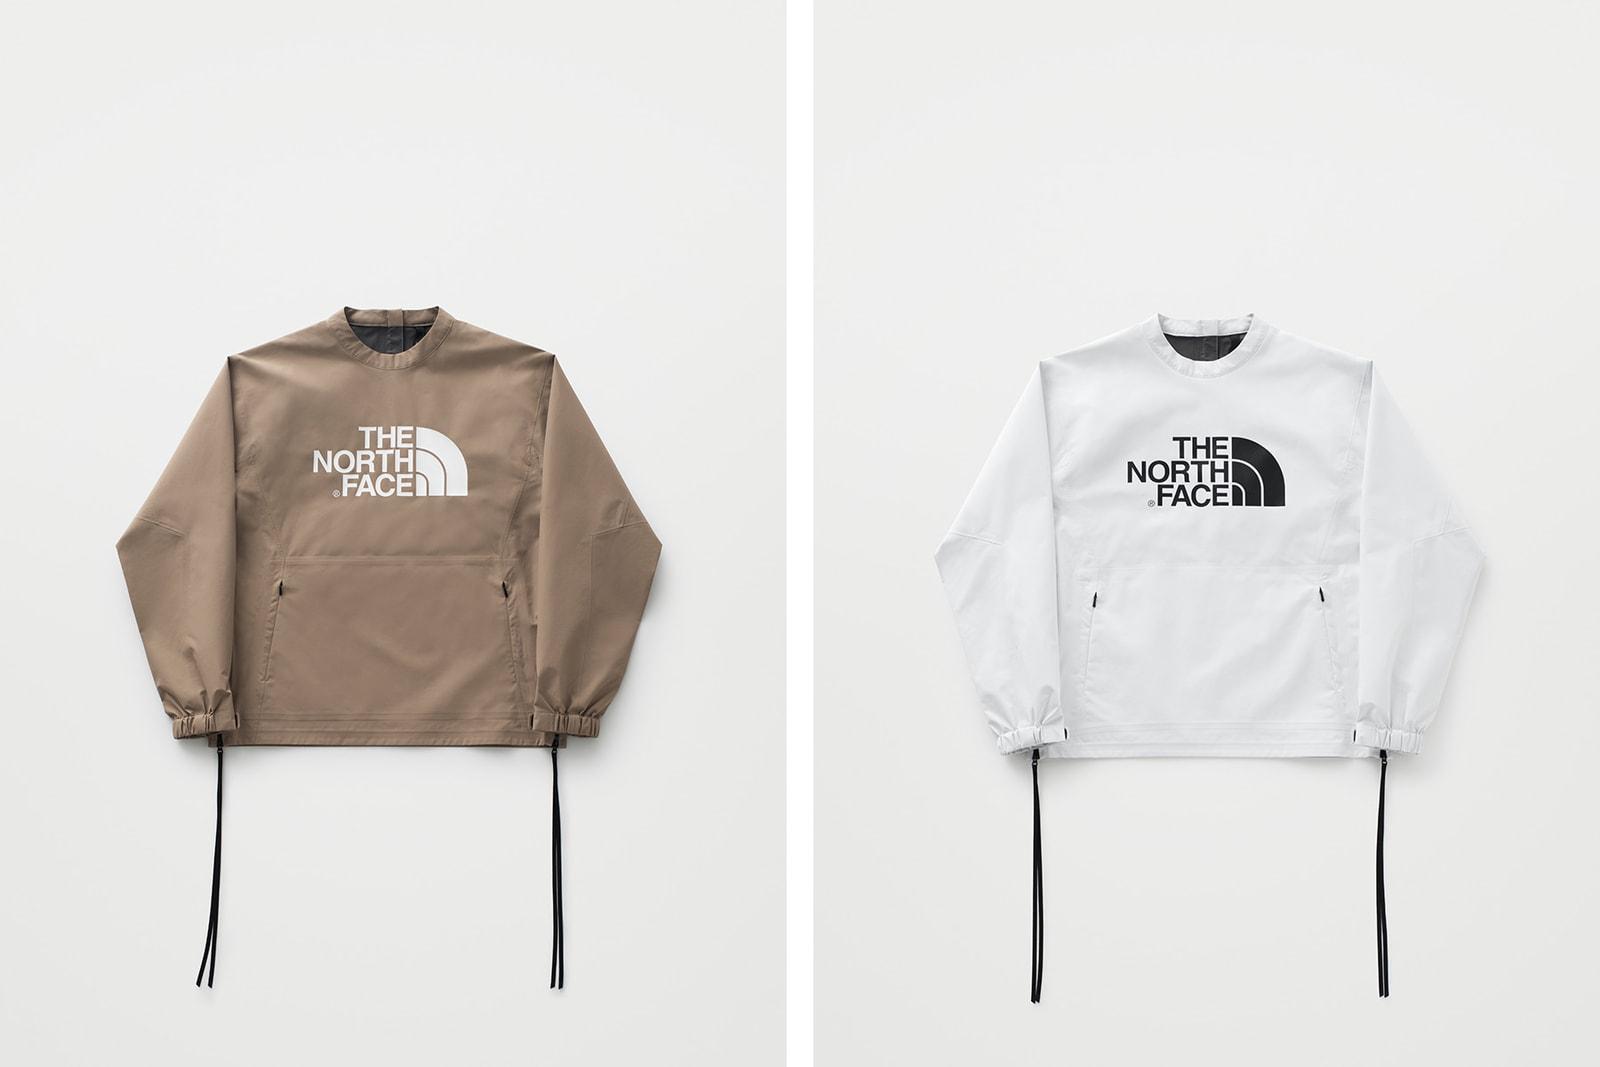 待望之男裝首次現身!The North Face x HYKE Spring/Summer 2019 季度 Lookbook 發表